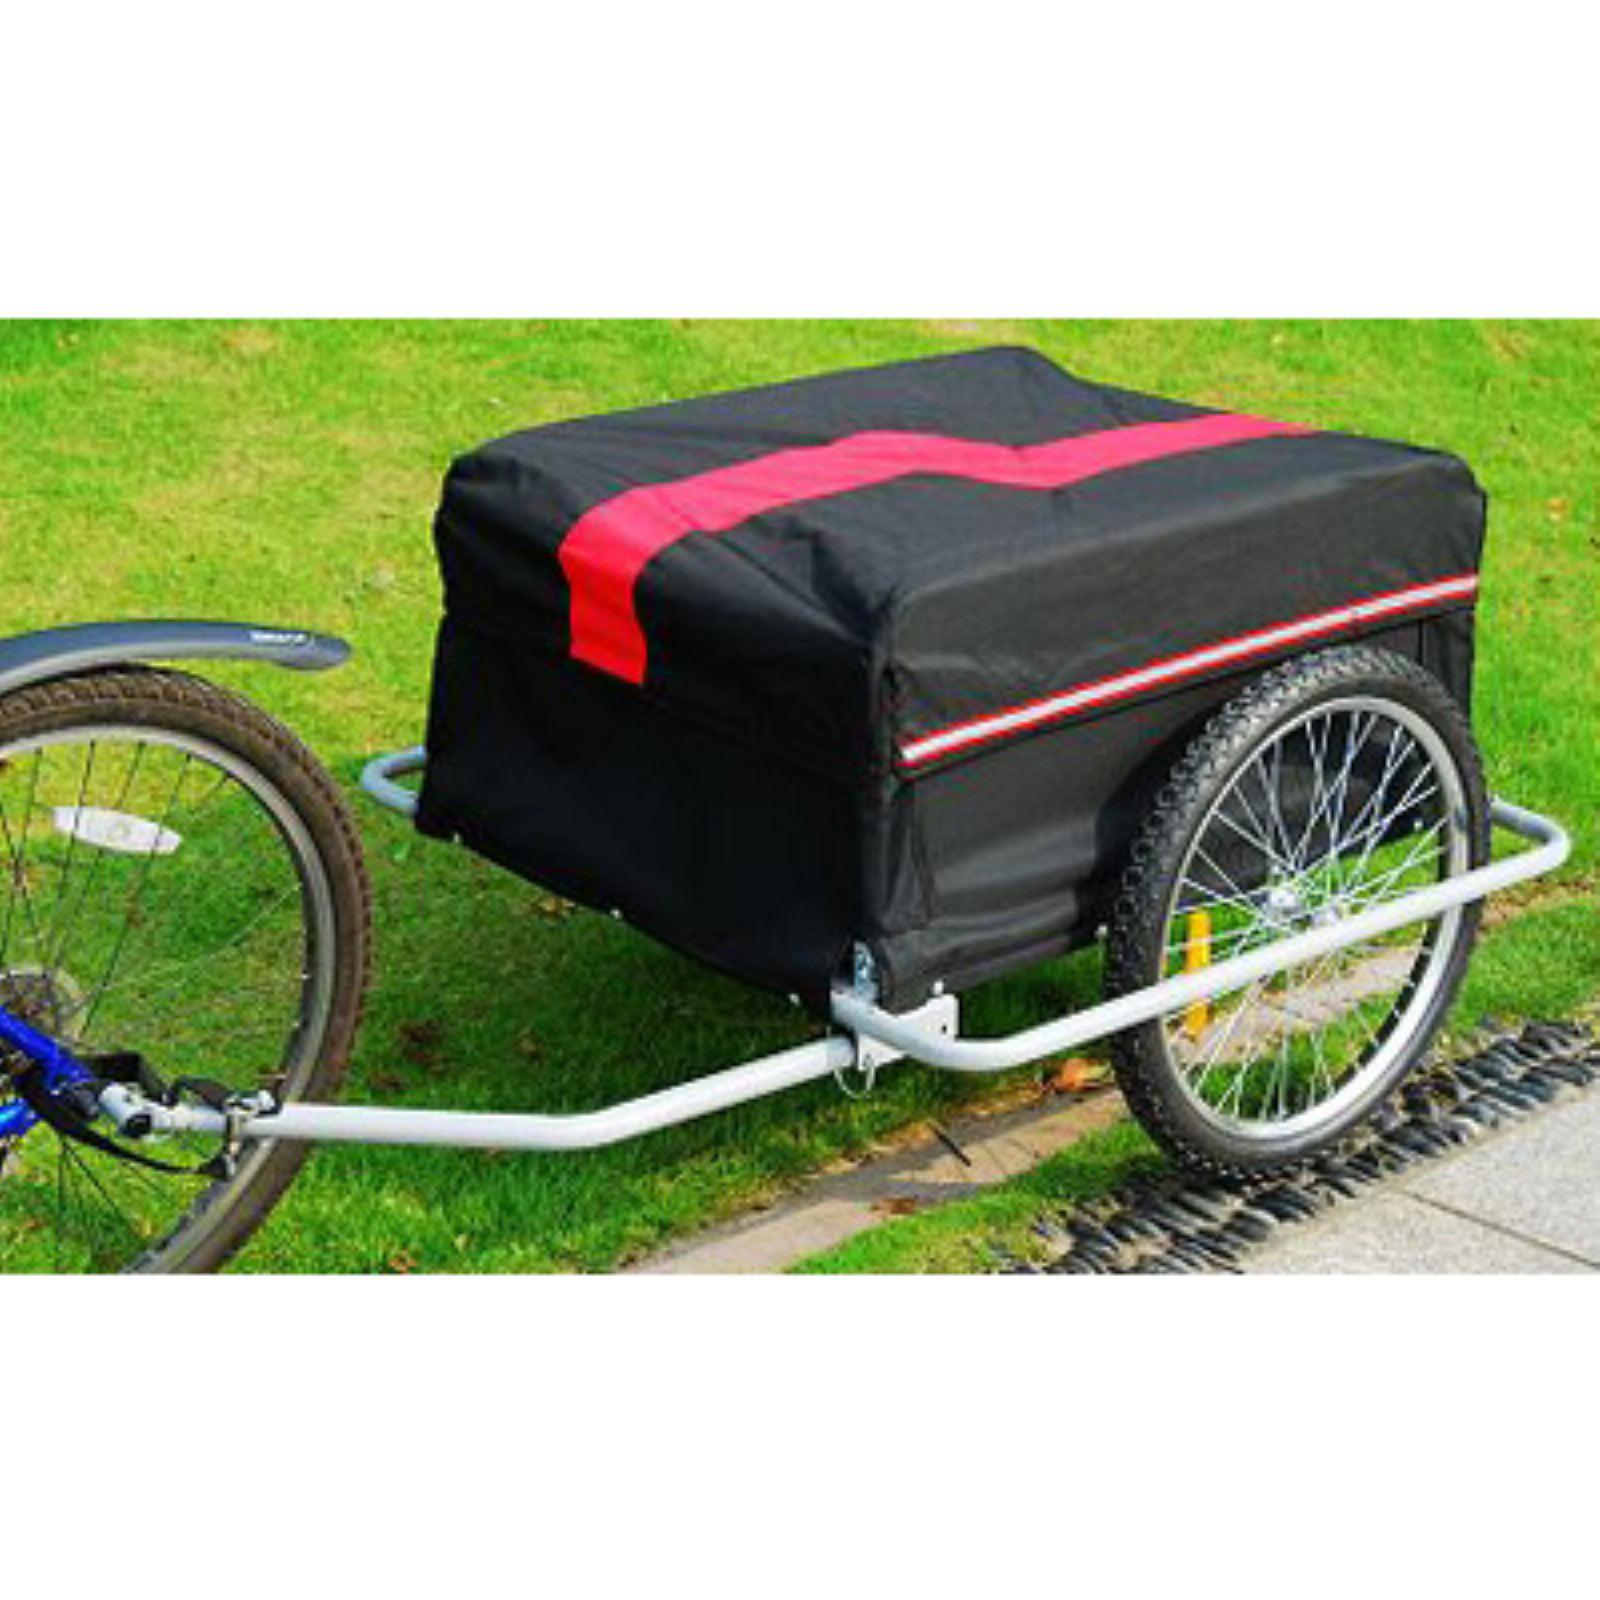 Aosom Elite II Large Bike Cargo Trailer - Black/Red Image 2 of 4